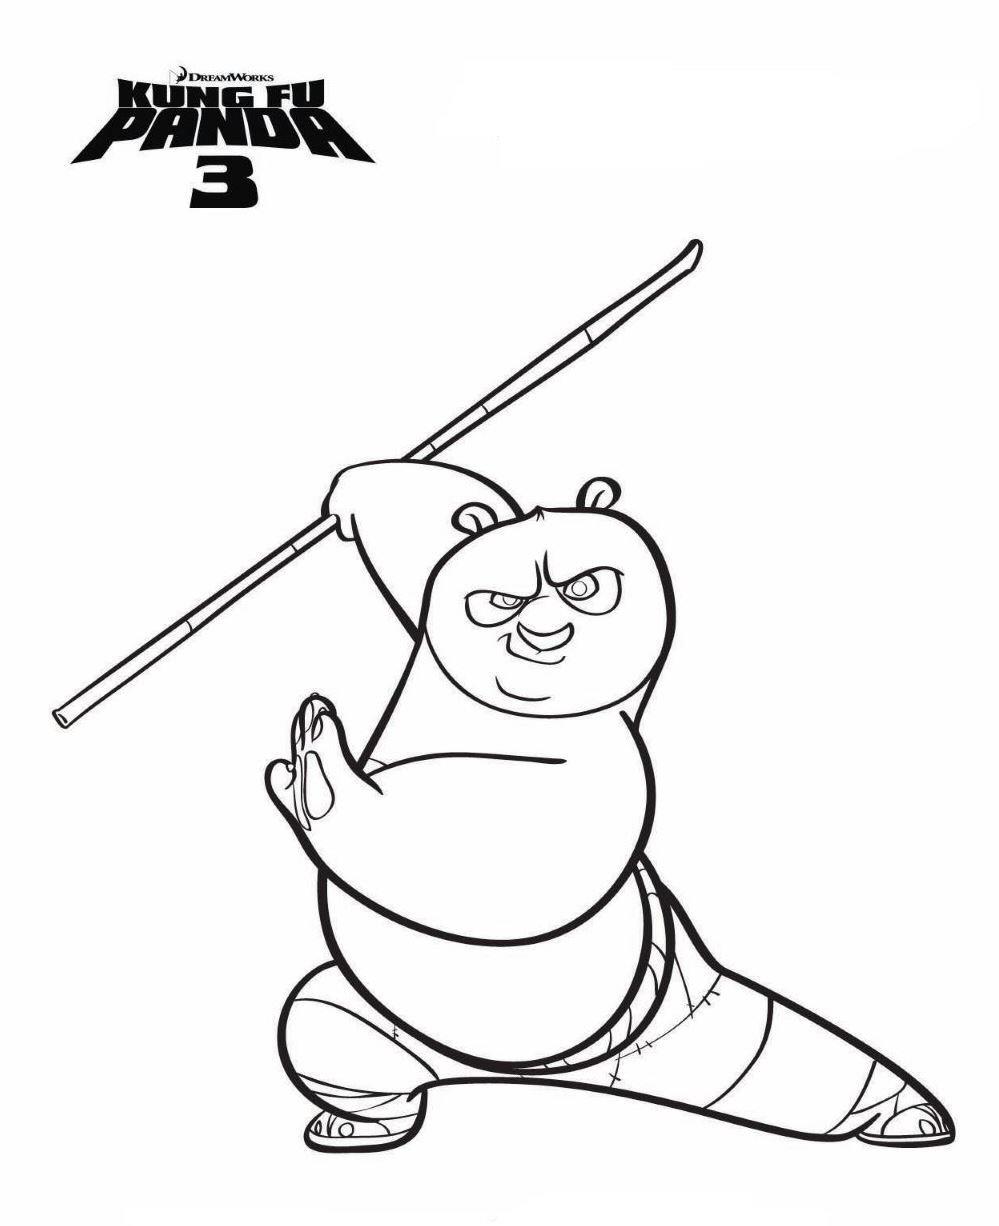 999x1226 Kung Fu Panda Coloring Pages Kids N Fun Com